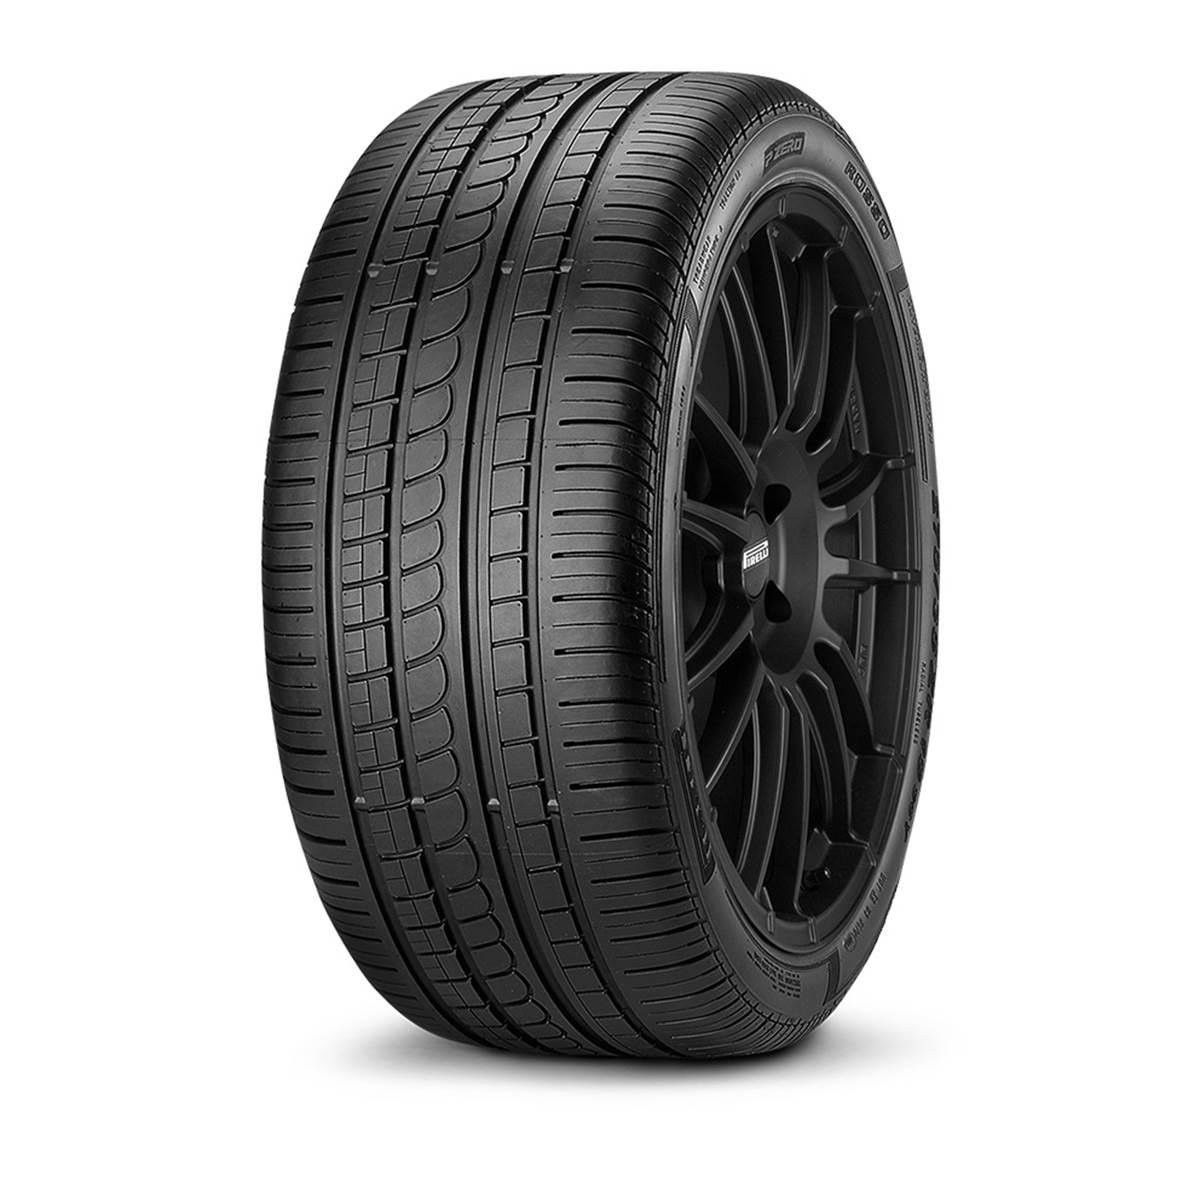 Pneu Pirelli 225/45R17 91Y Pzero Rosso Asimmetr homologué Porsche